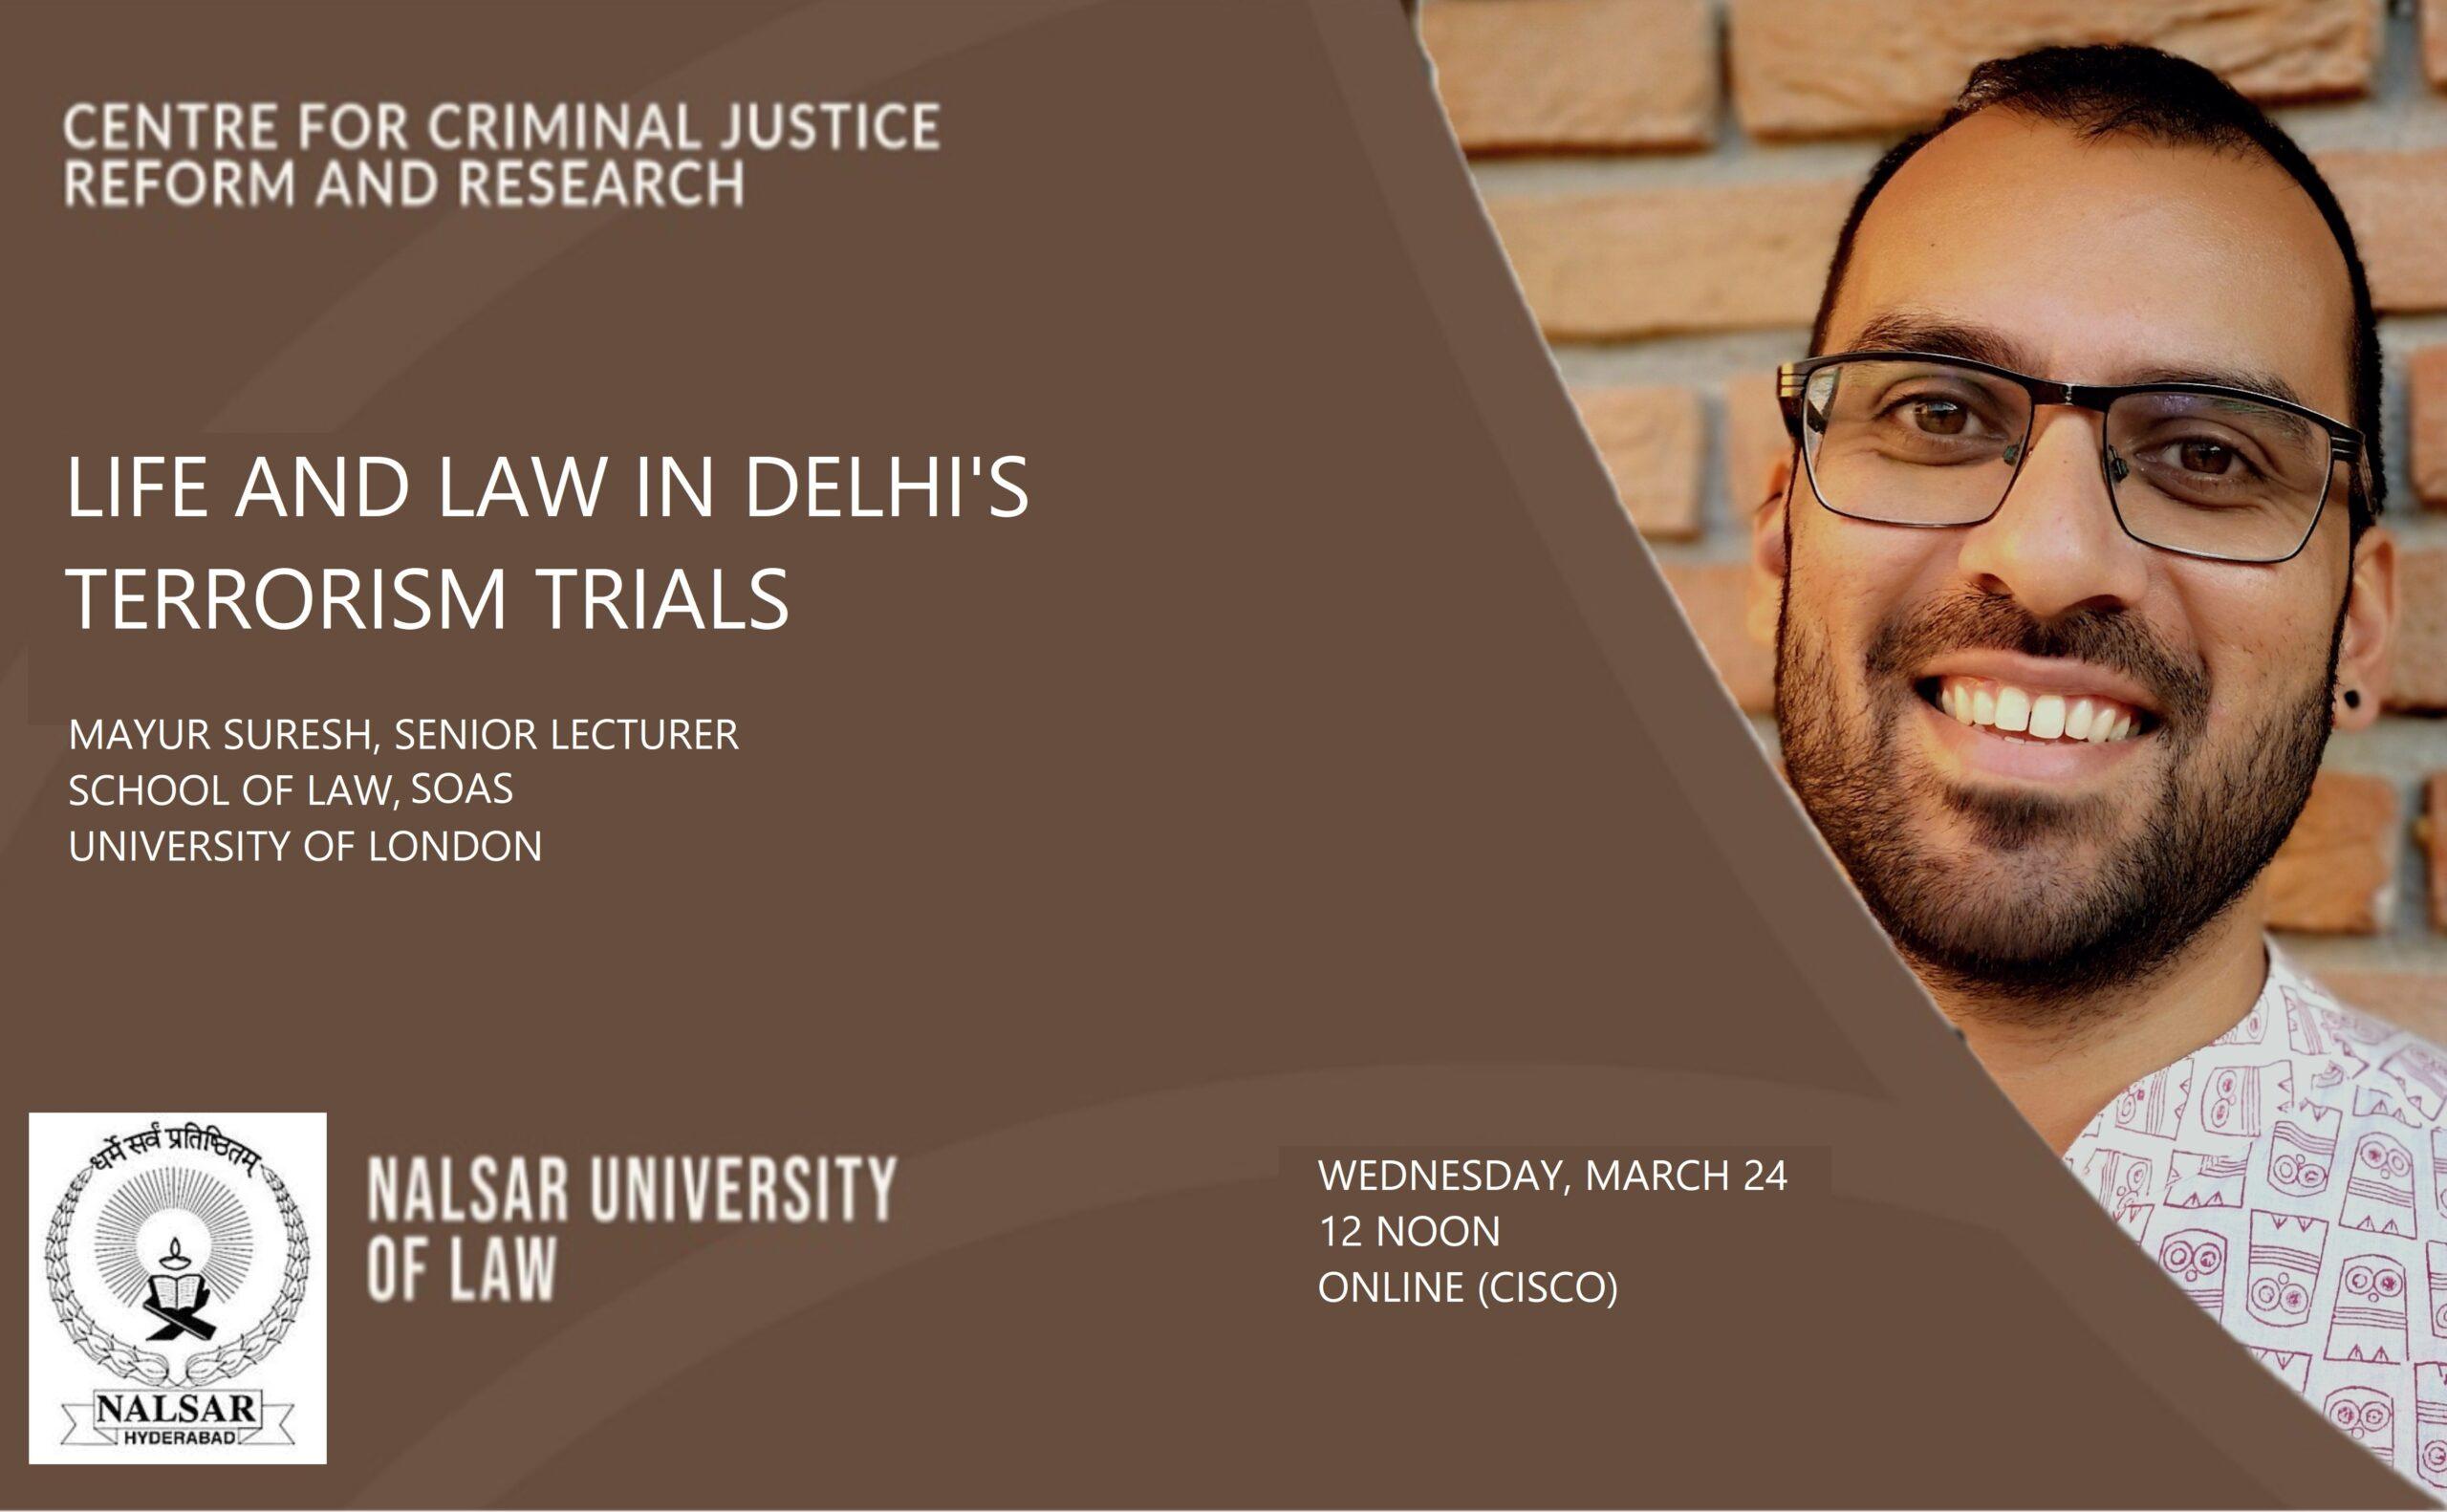 NALSAR Talk on Life and Law in Delhi's Terrorism Trials